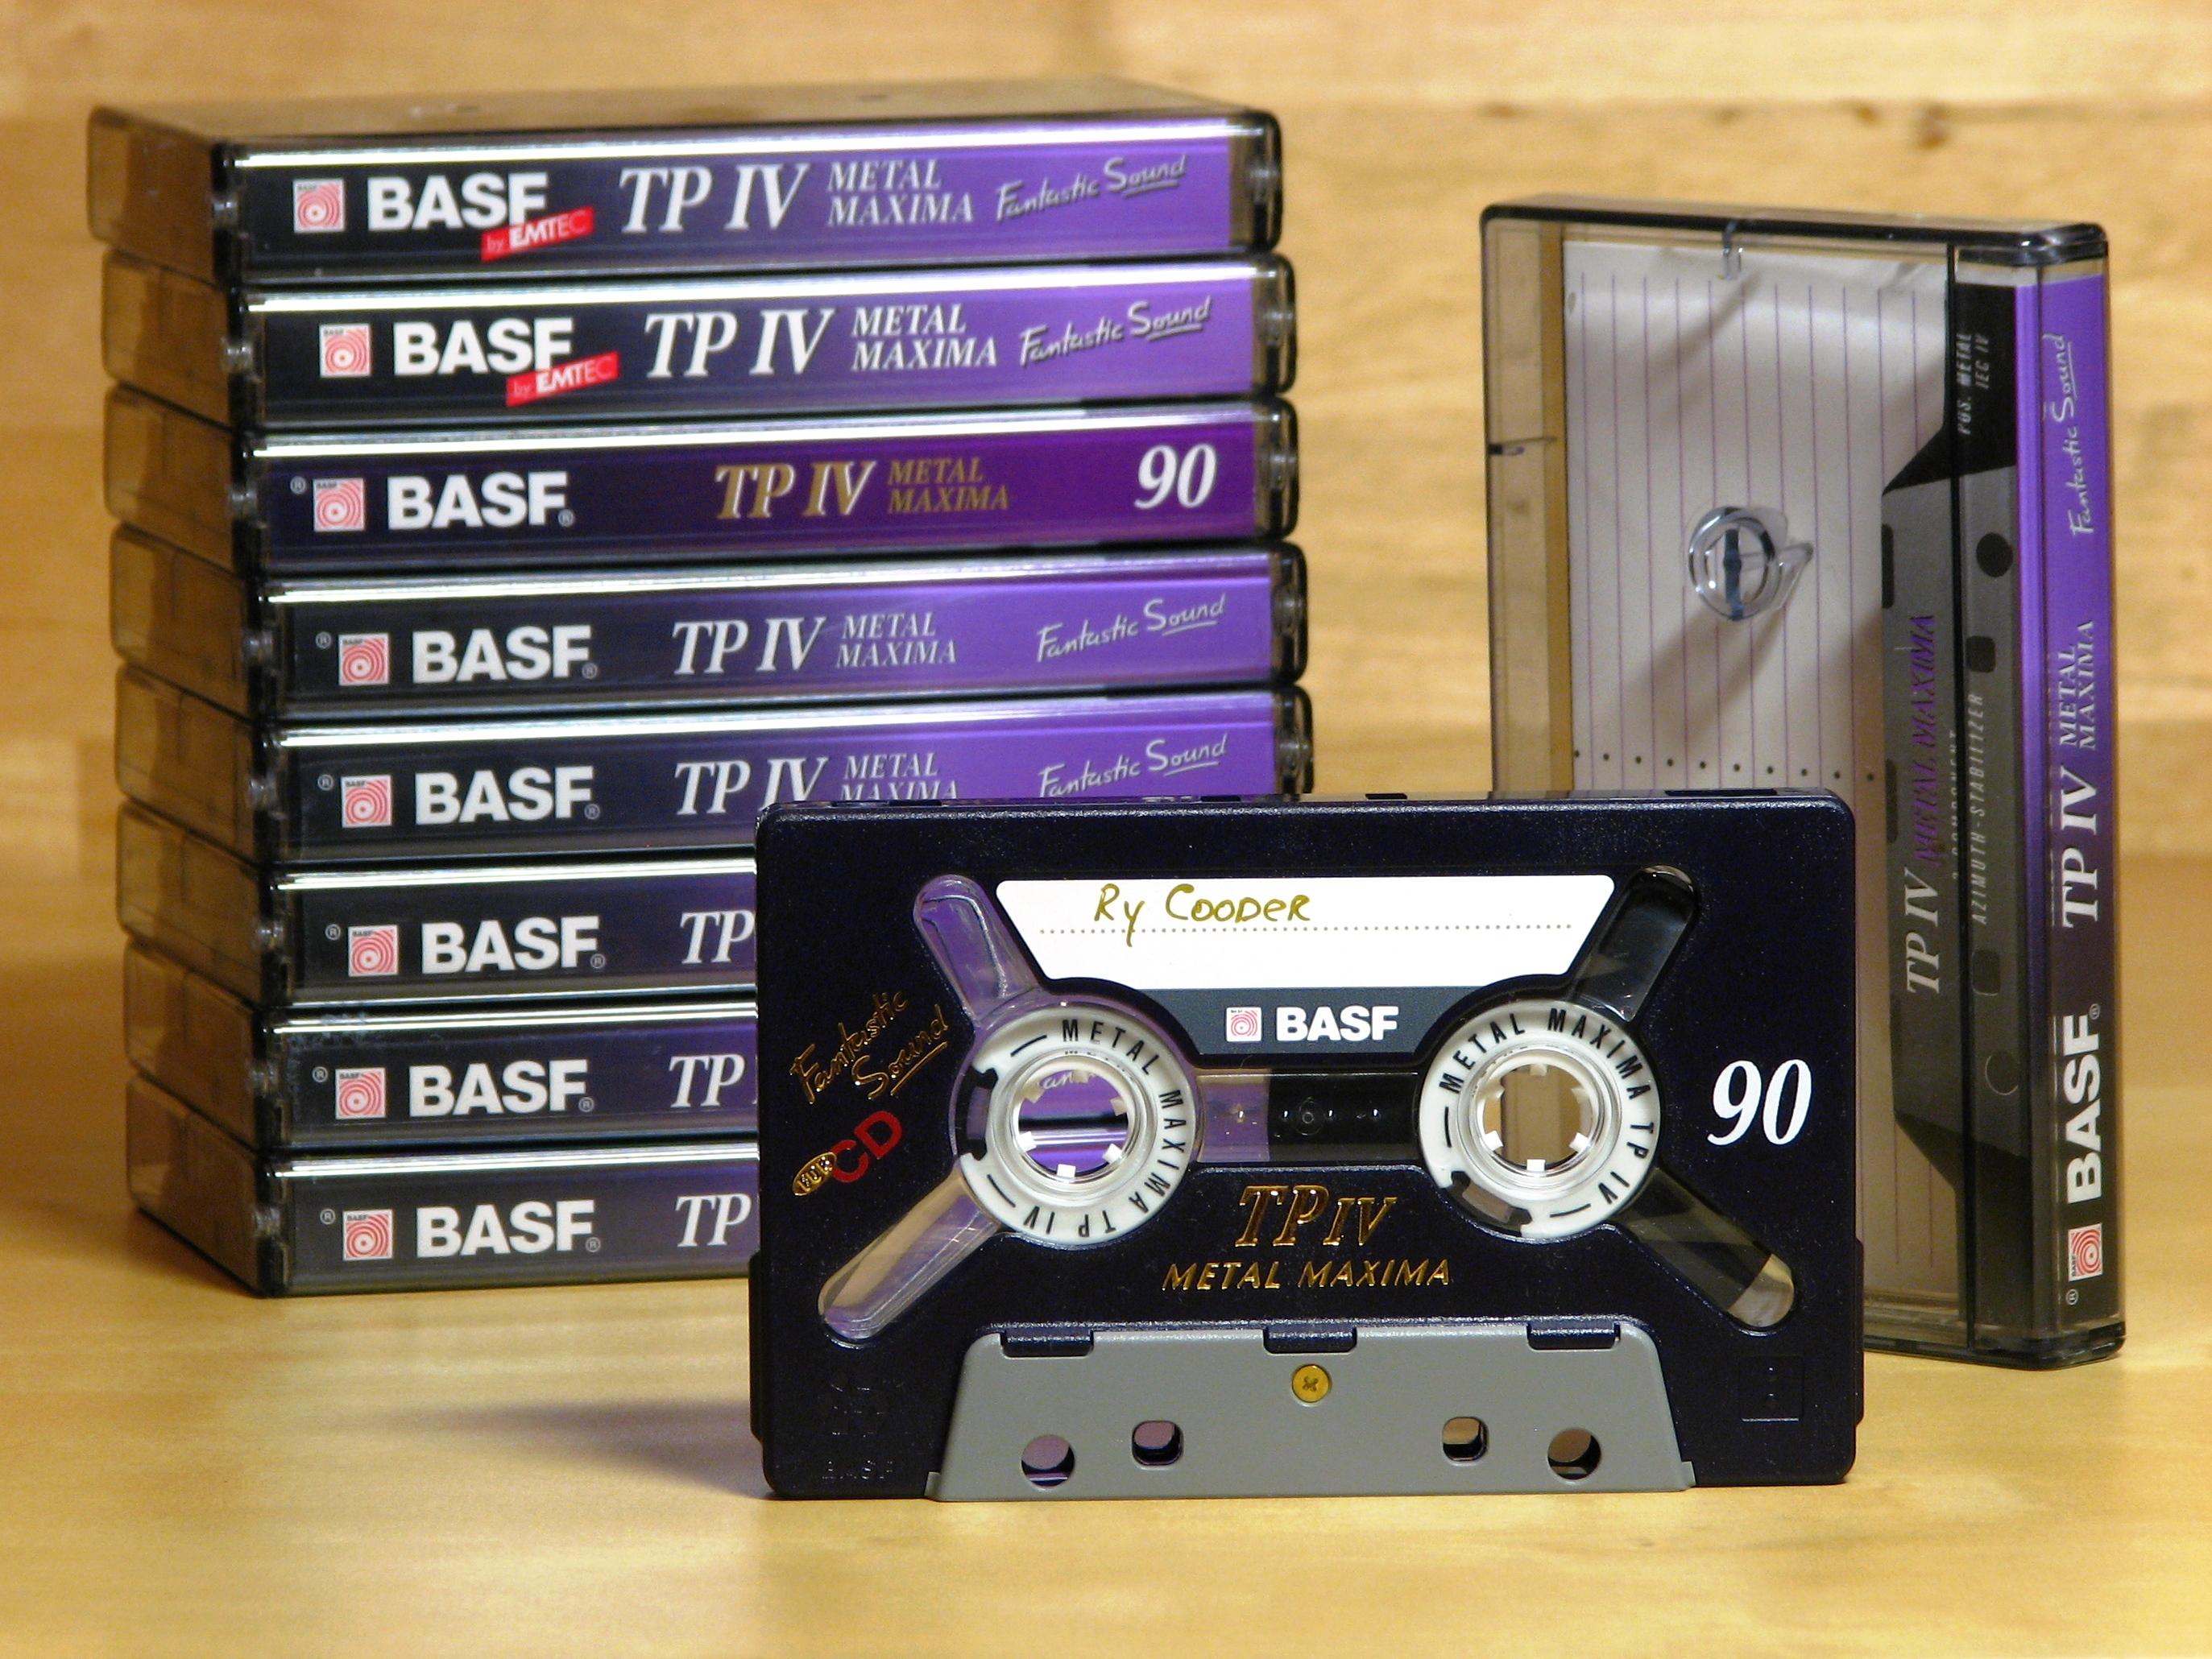 Compact_Cassette_-_BASF_TP_IV_Metal_Maxima_90_%28slim%29.JPG